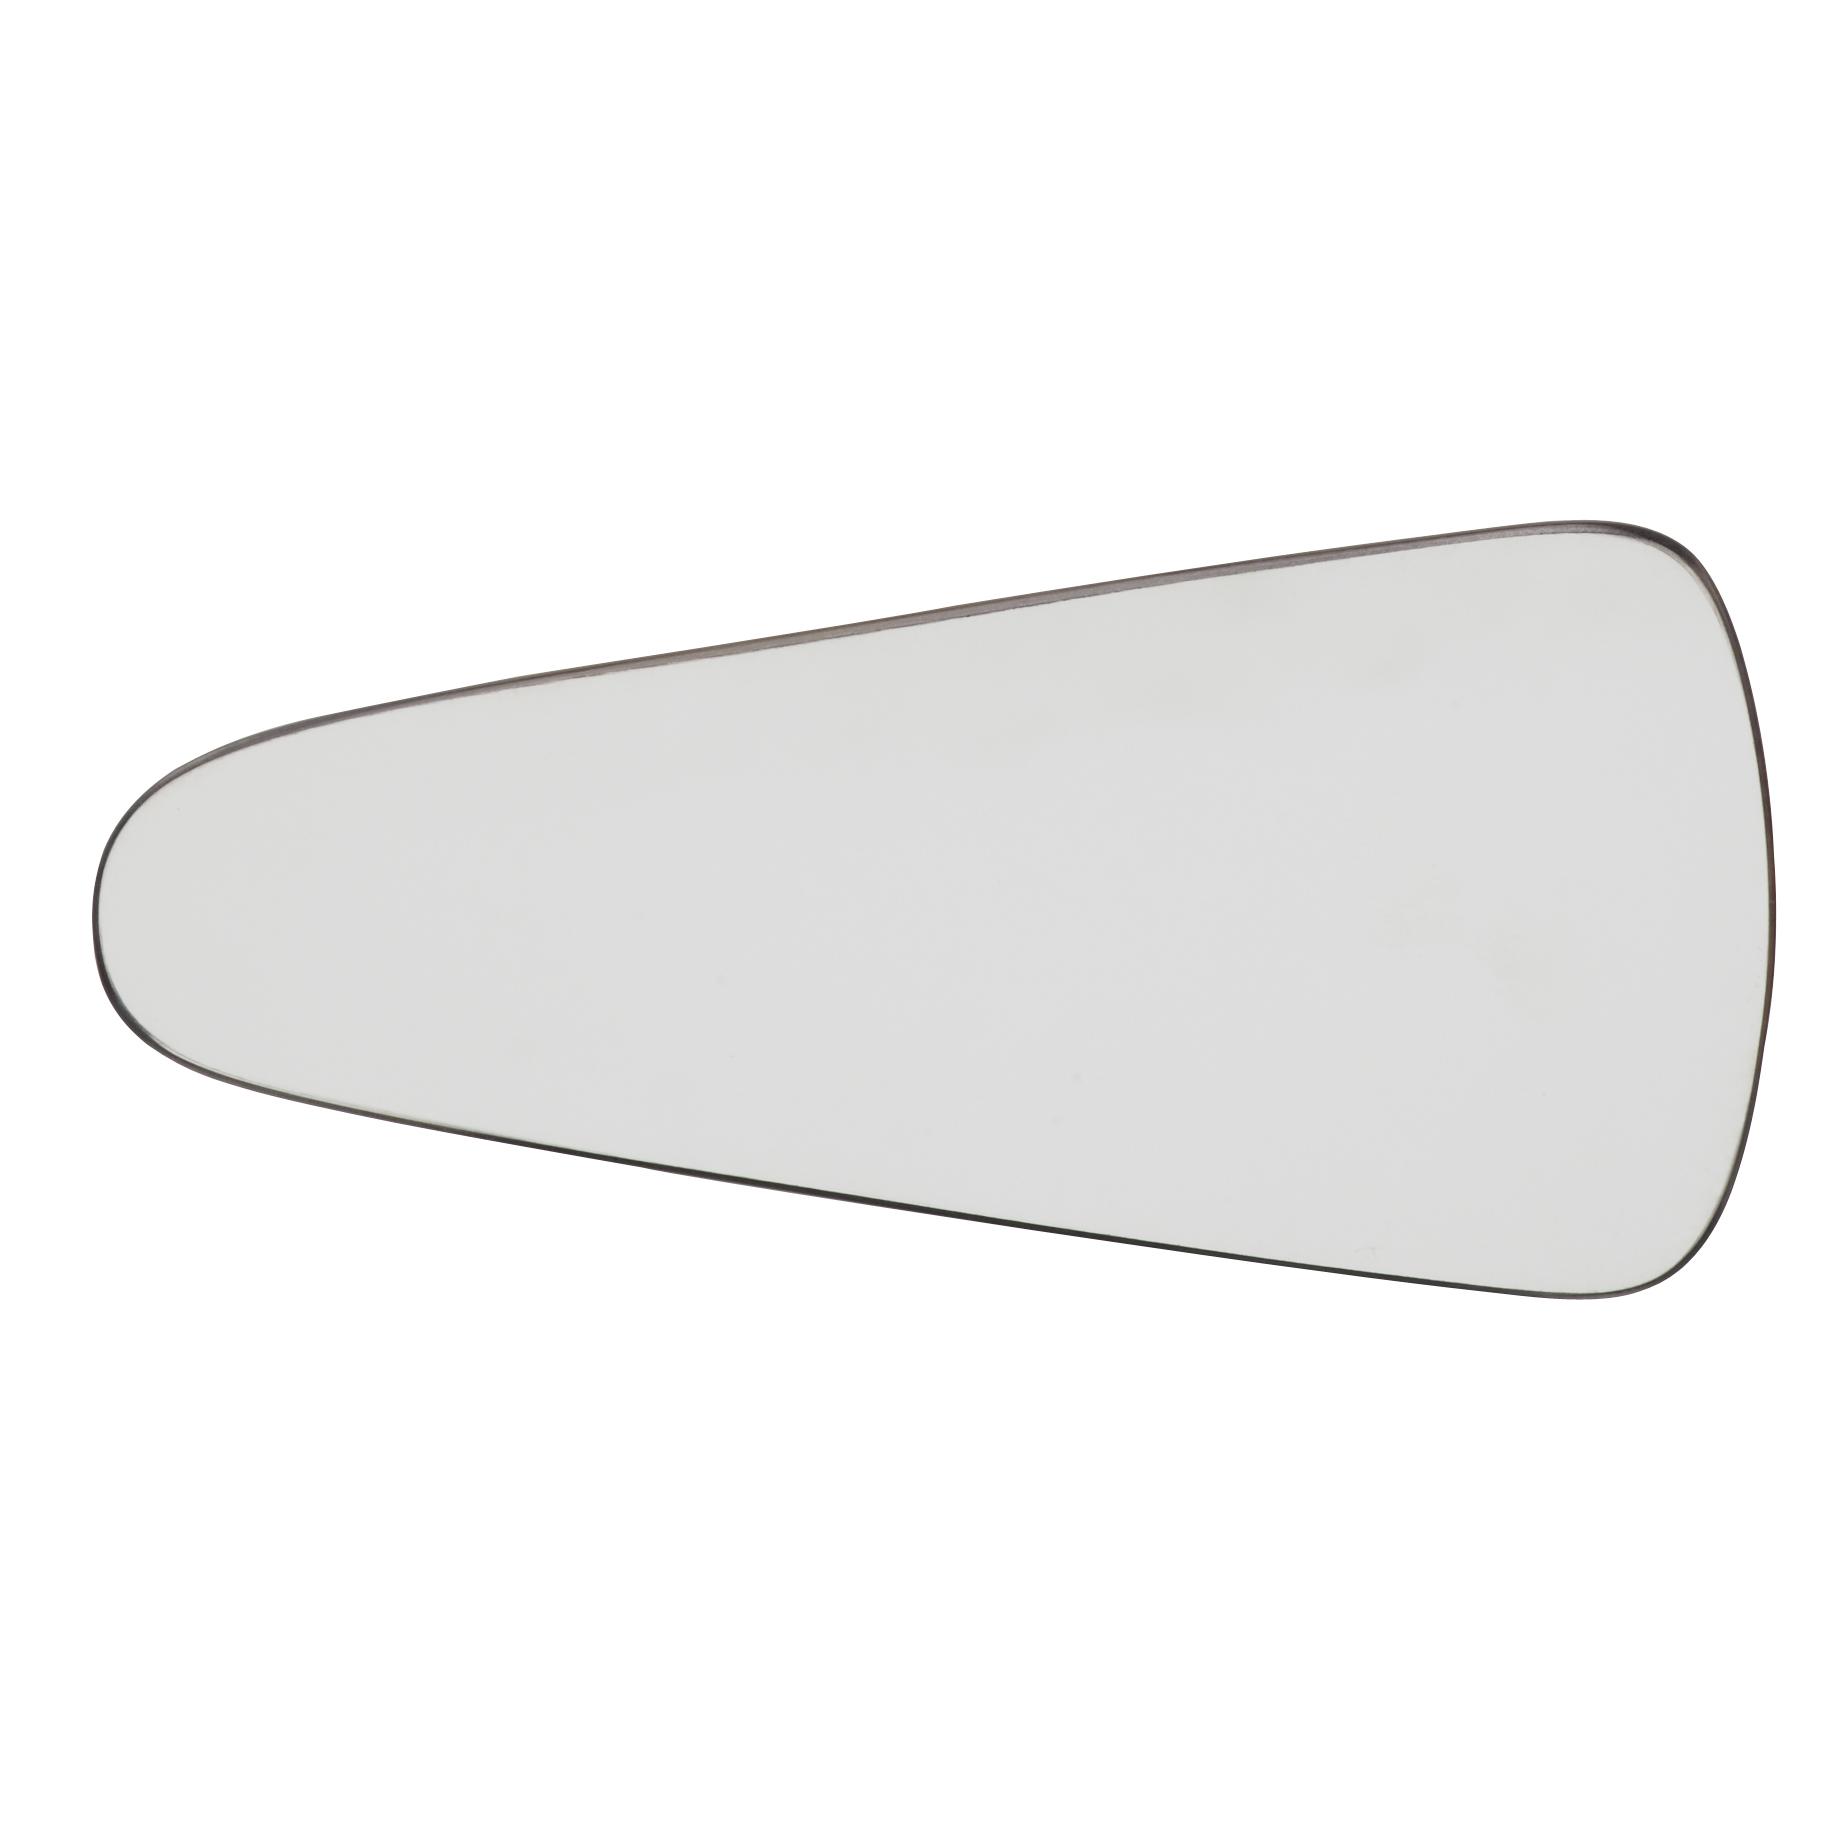 Miroir photographique buccal chrome technimirror for Miroir double face